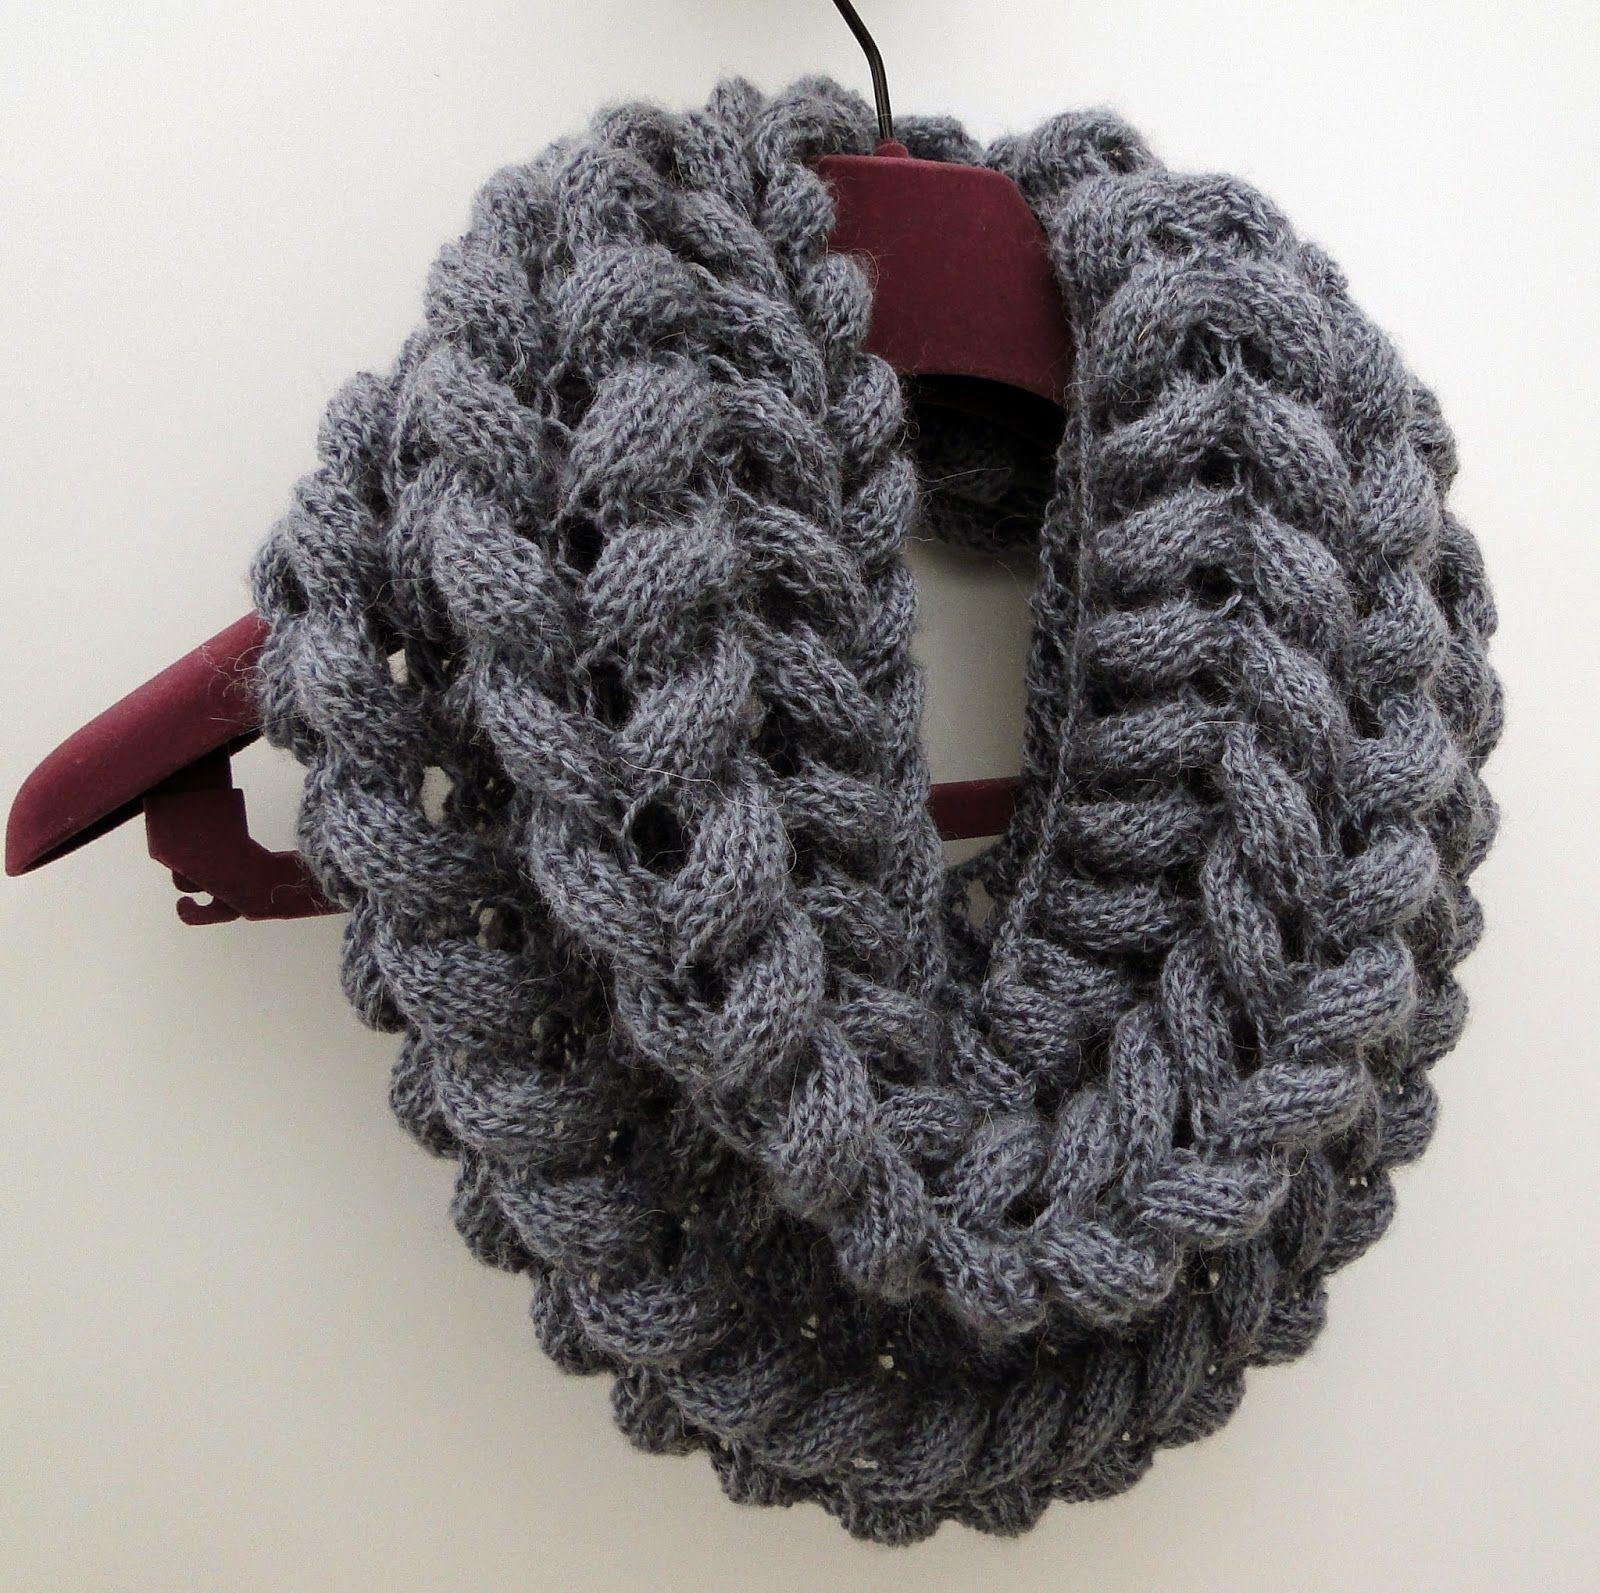 Scarf Cowl Knitting Pattern | Snood knitting pattern ...